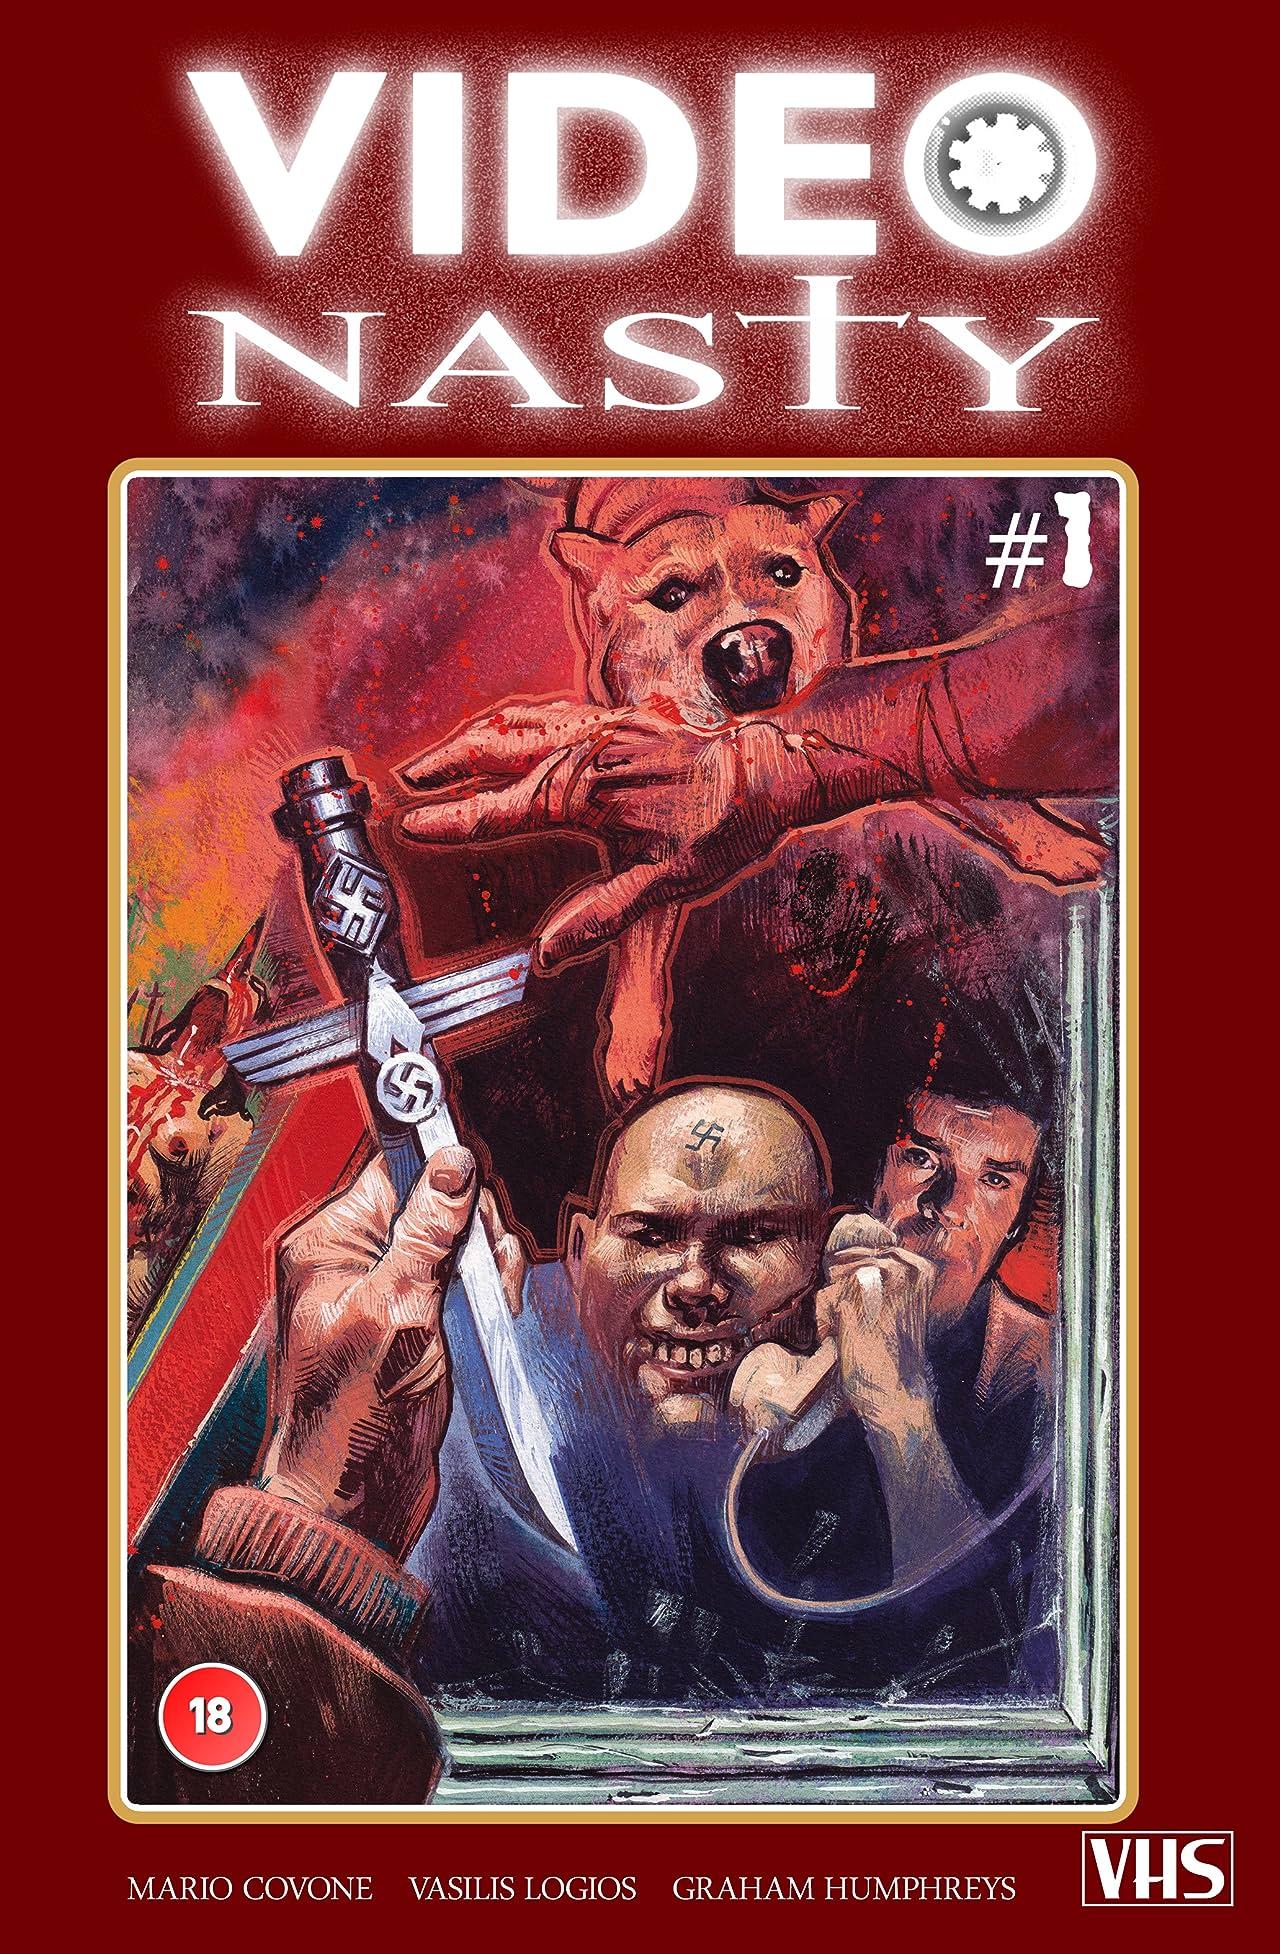 Video Nasty #1